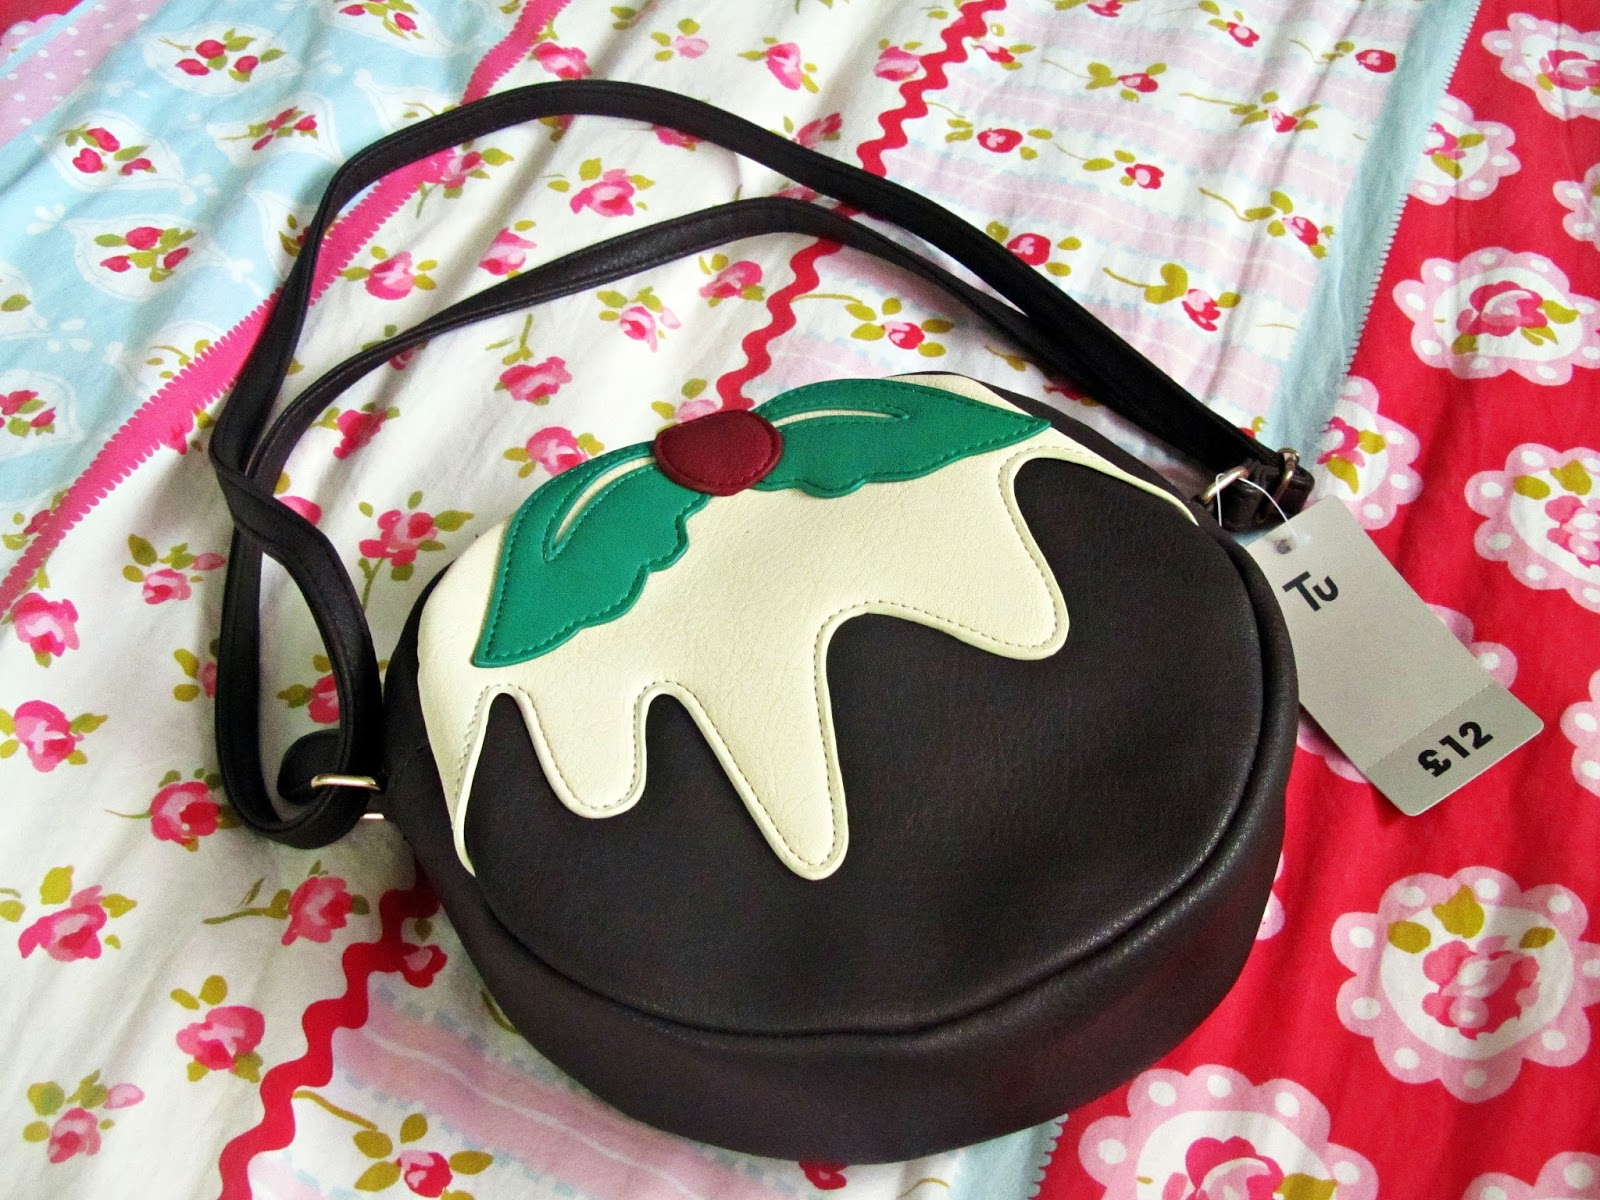 my novelty christmas handbags polka spots and freckle dots - Christmas Purses Handbags